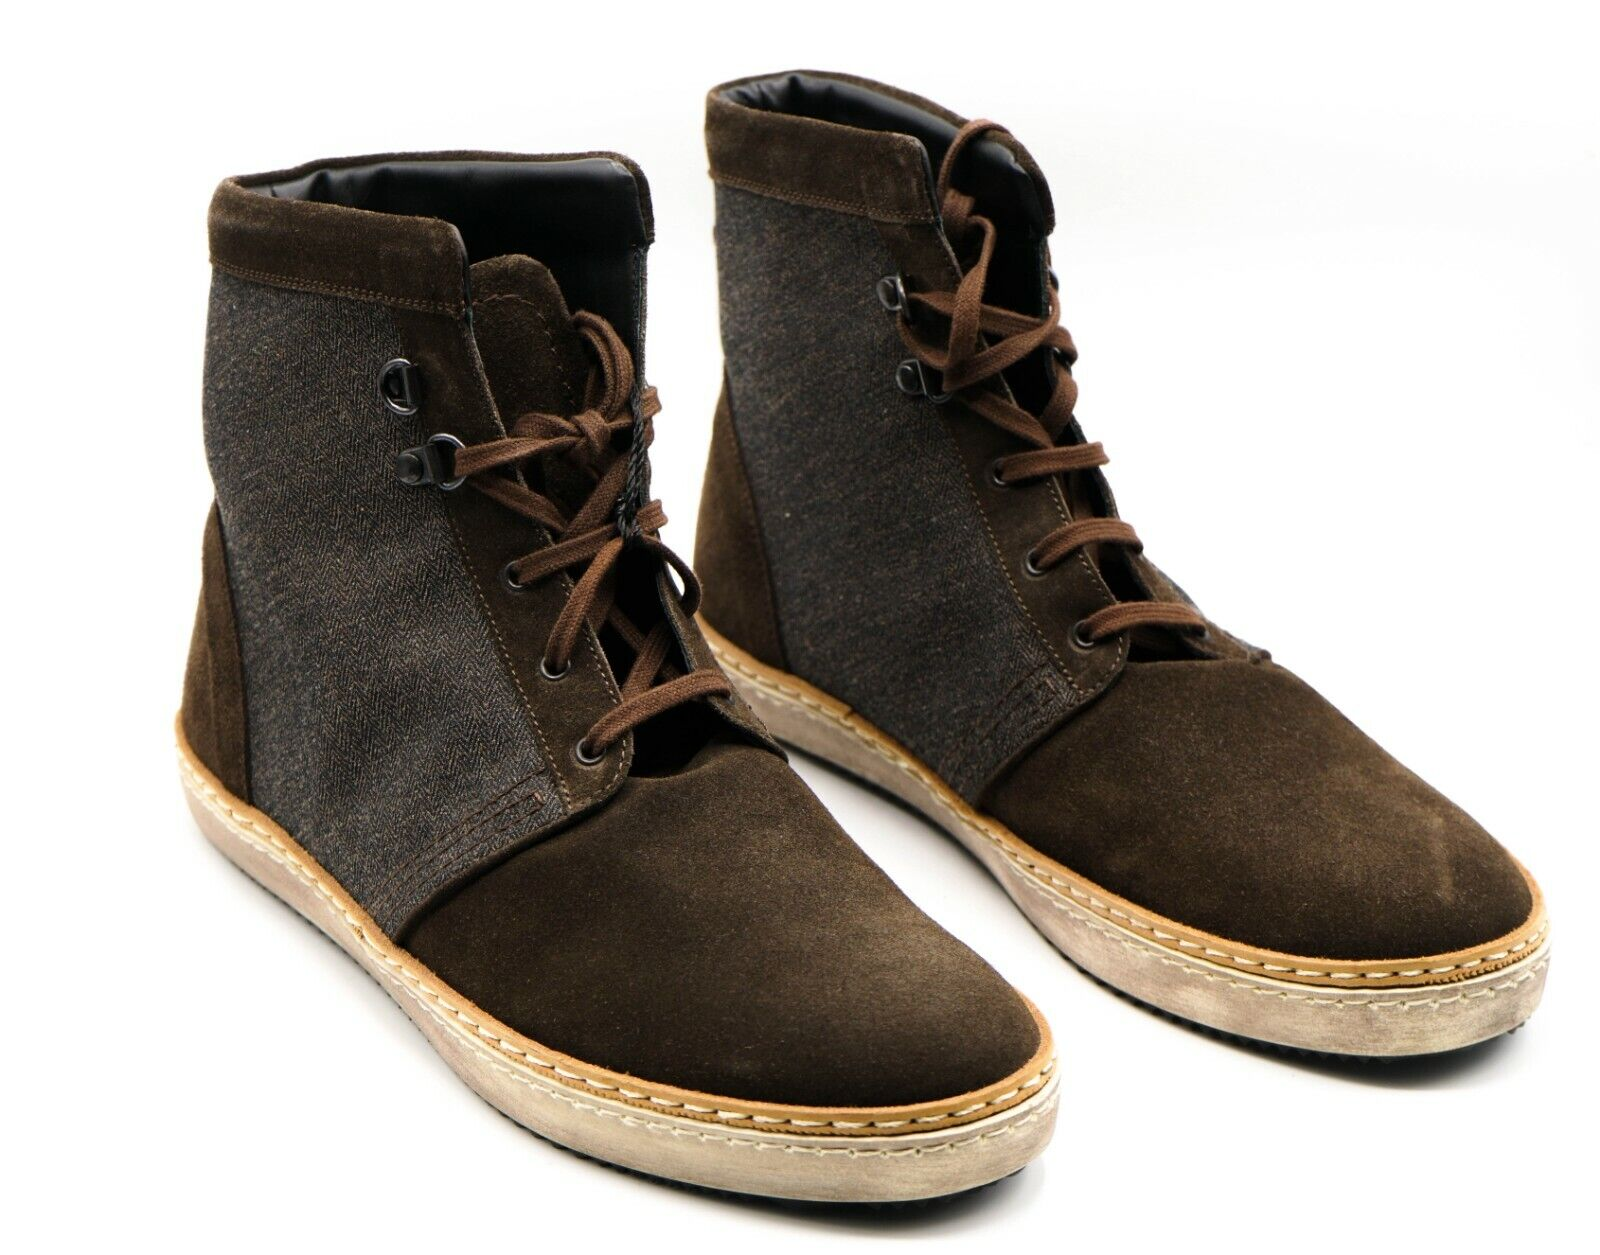 NEW KITON Napoli Boots Dress Leather Shoes Size Eu 42.5 Uk 8.5 Us 9.5 (KIS34)